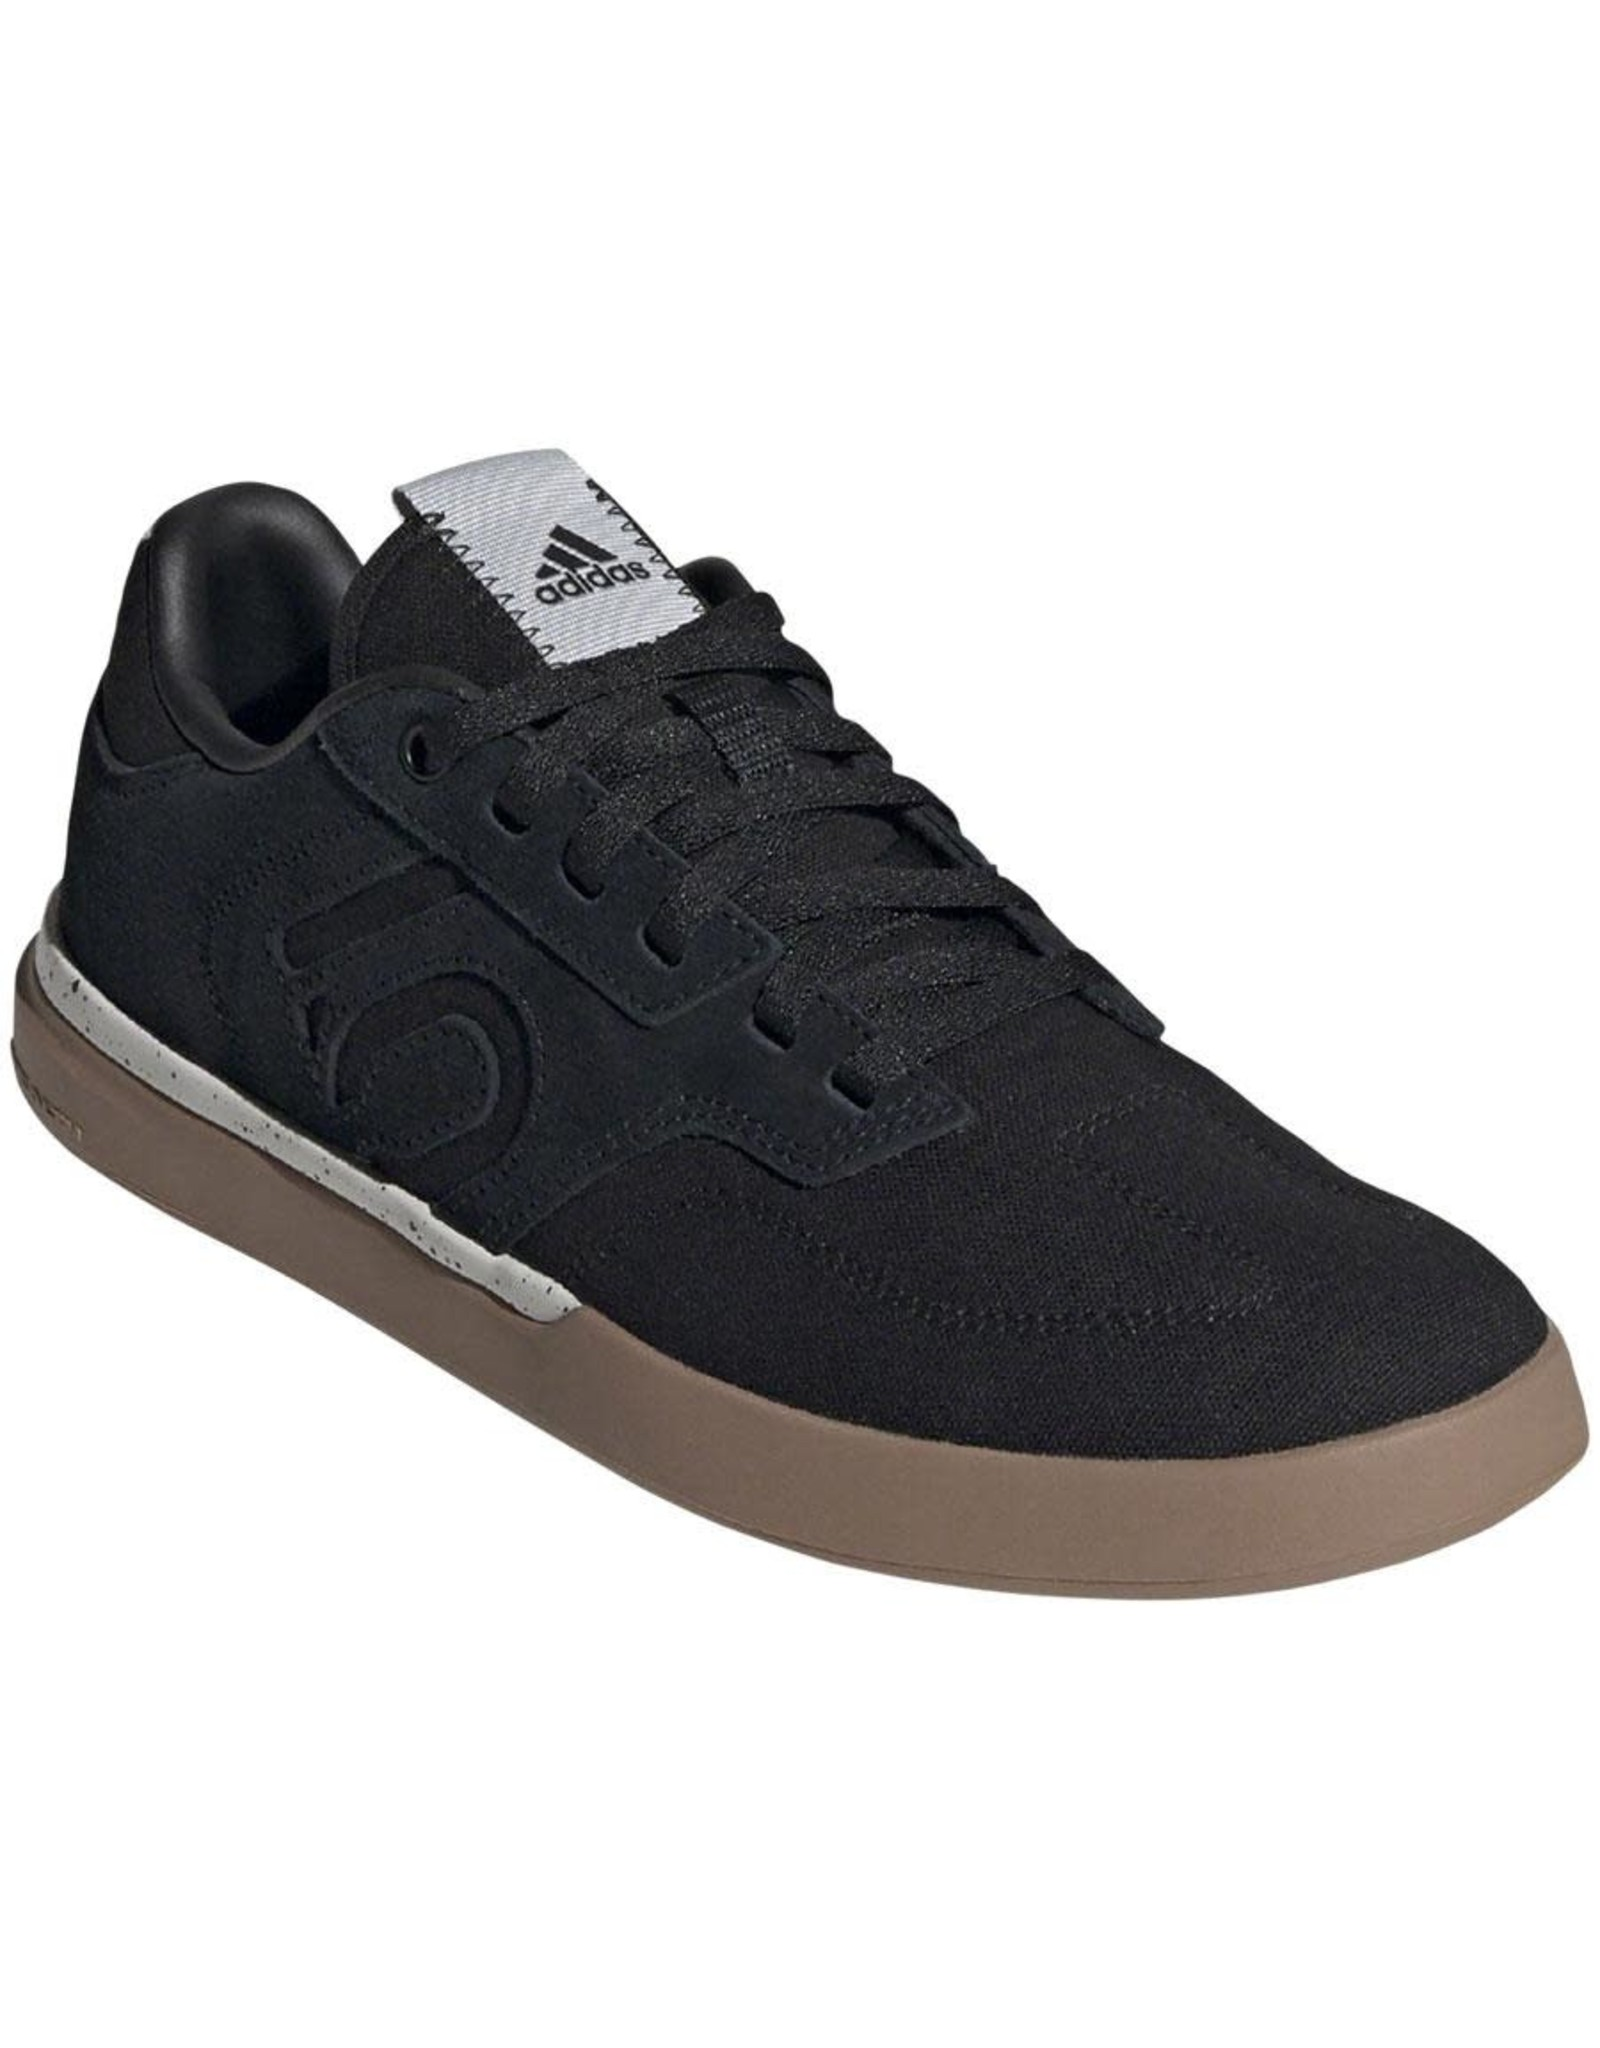 Five Ten Five Ten Sleuth Men's Flat Shoe: Black/Black/Gum